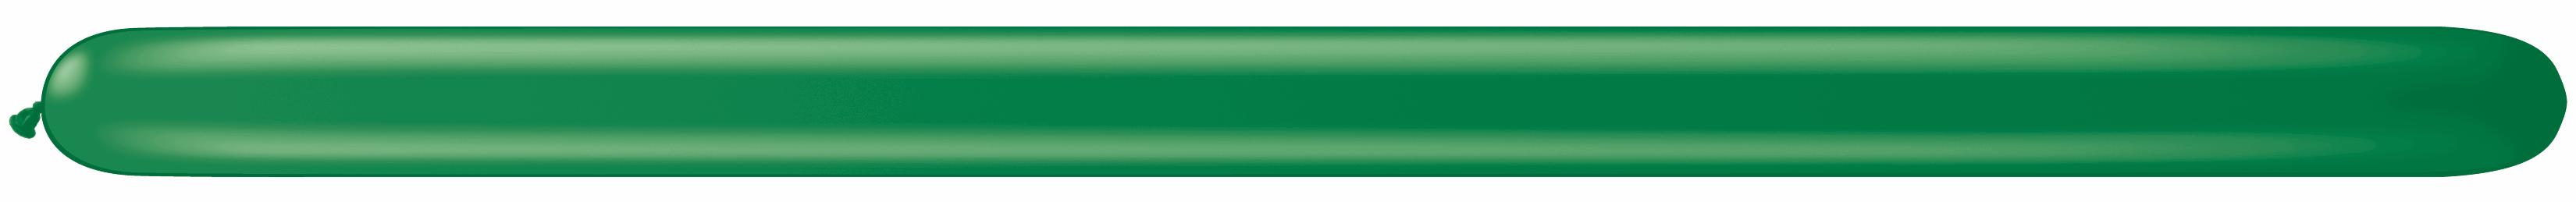 350Q Latex Balloons (100 Count) Green